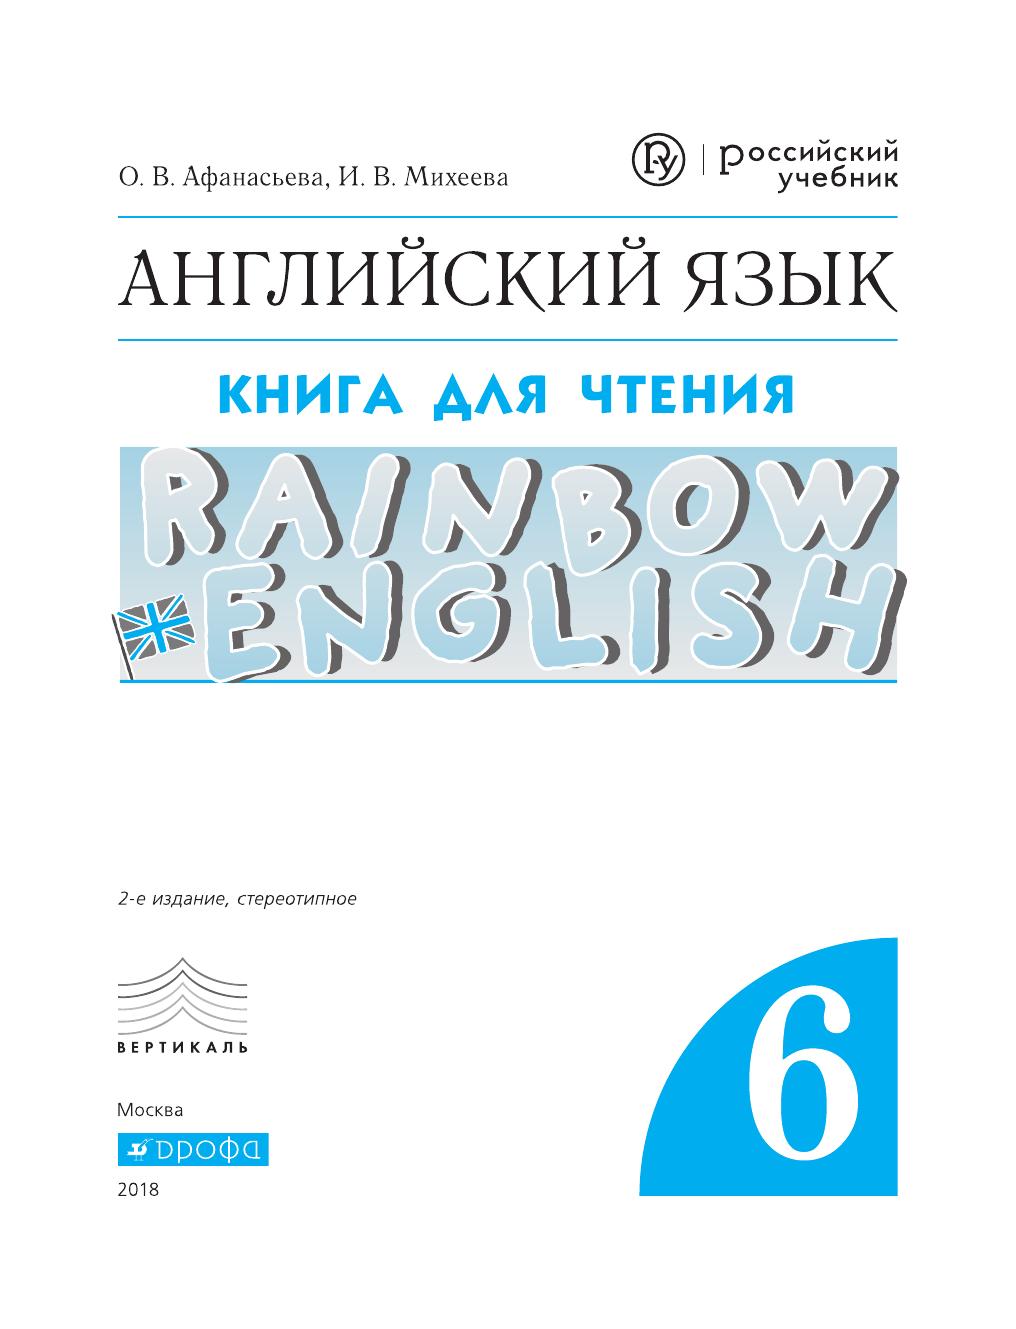 Афанасьева класс гдз 6 2018 михеева английский